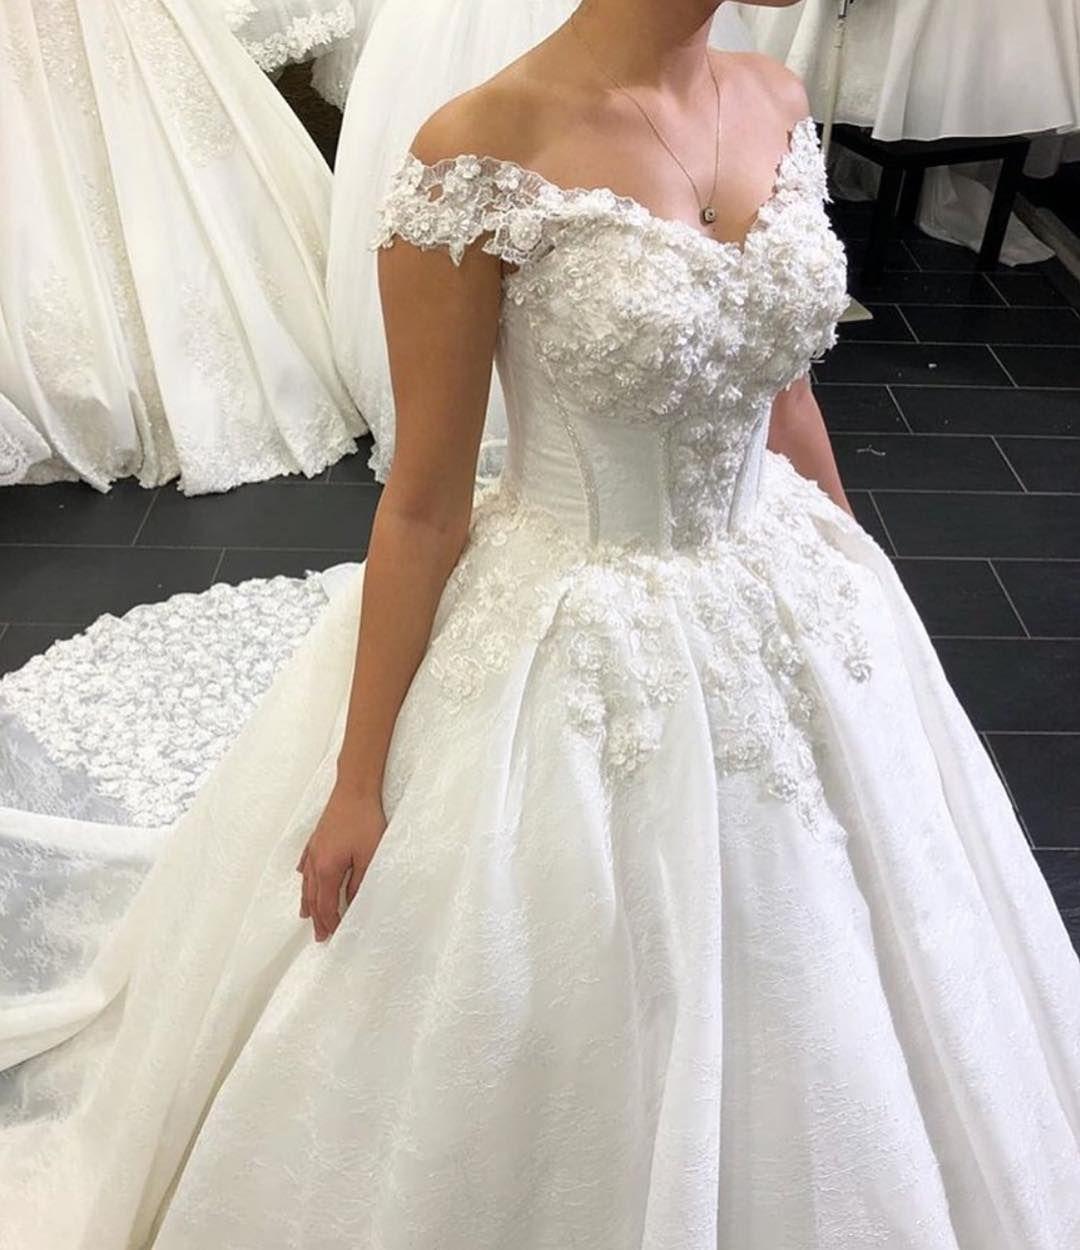 Custom Wedding Dresses And Bespoke Bridal Attire Wedding Dresses Bespoke Wedding Dress Designer Wedding Dresses [ 1250 x 1080 Pixel ]